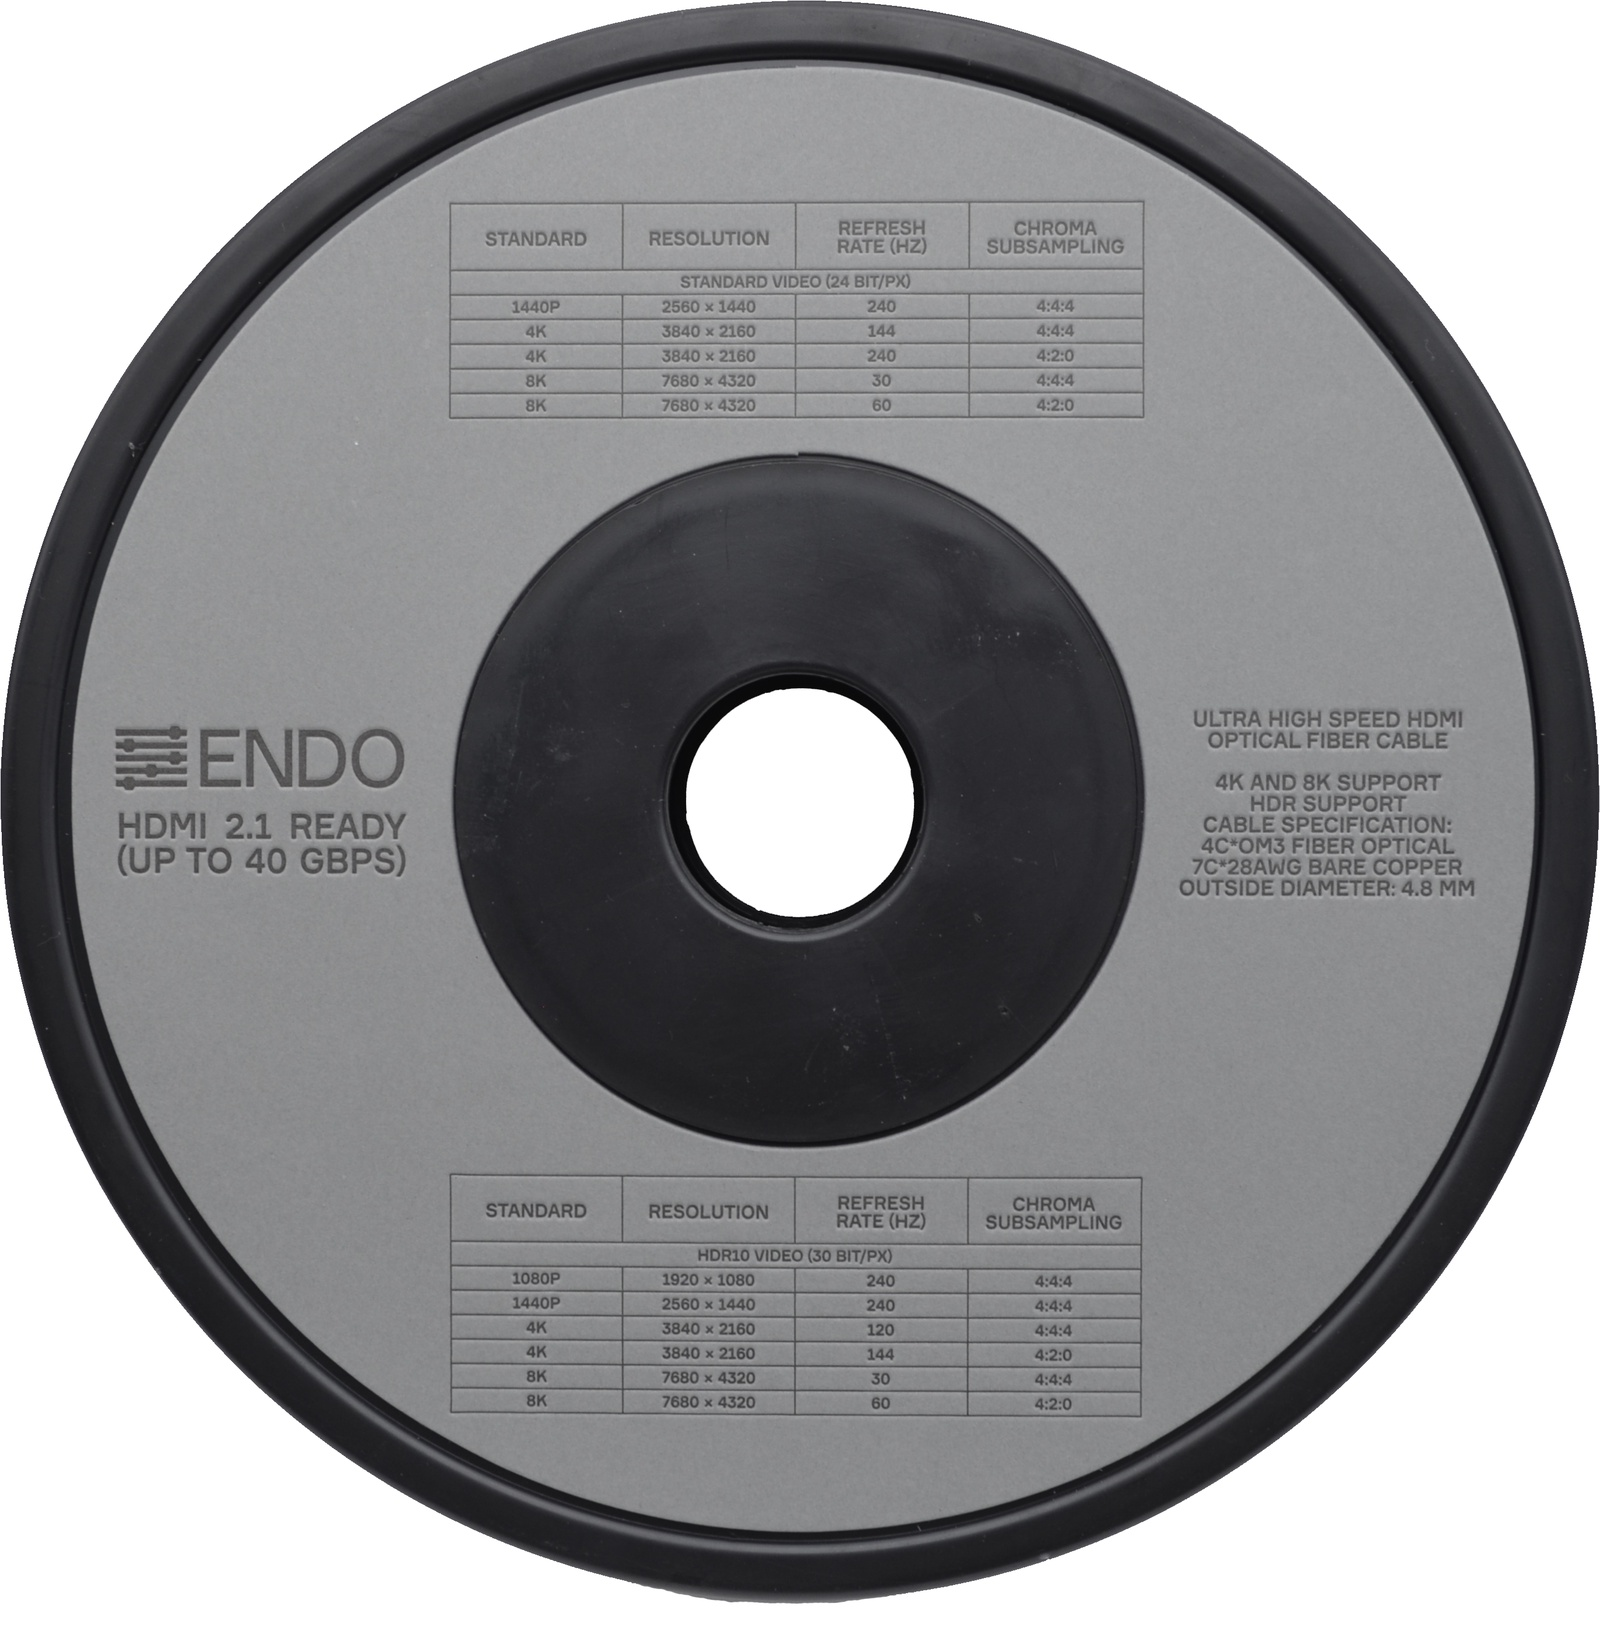 Кабель ENDO Inspiration HDMI 2.1 READY Optical fiber cable кабель hdmi inakustik exzellenz hdmi 2 0 optical fiber cable 20 m